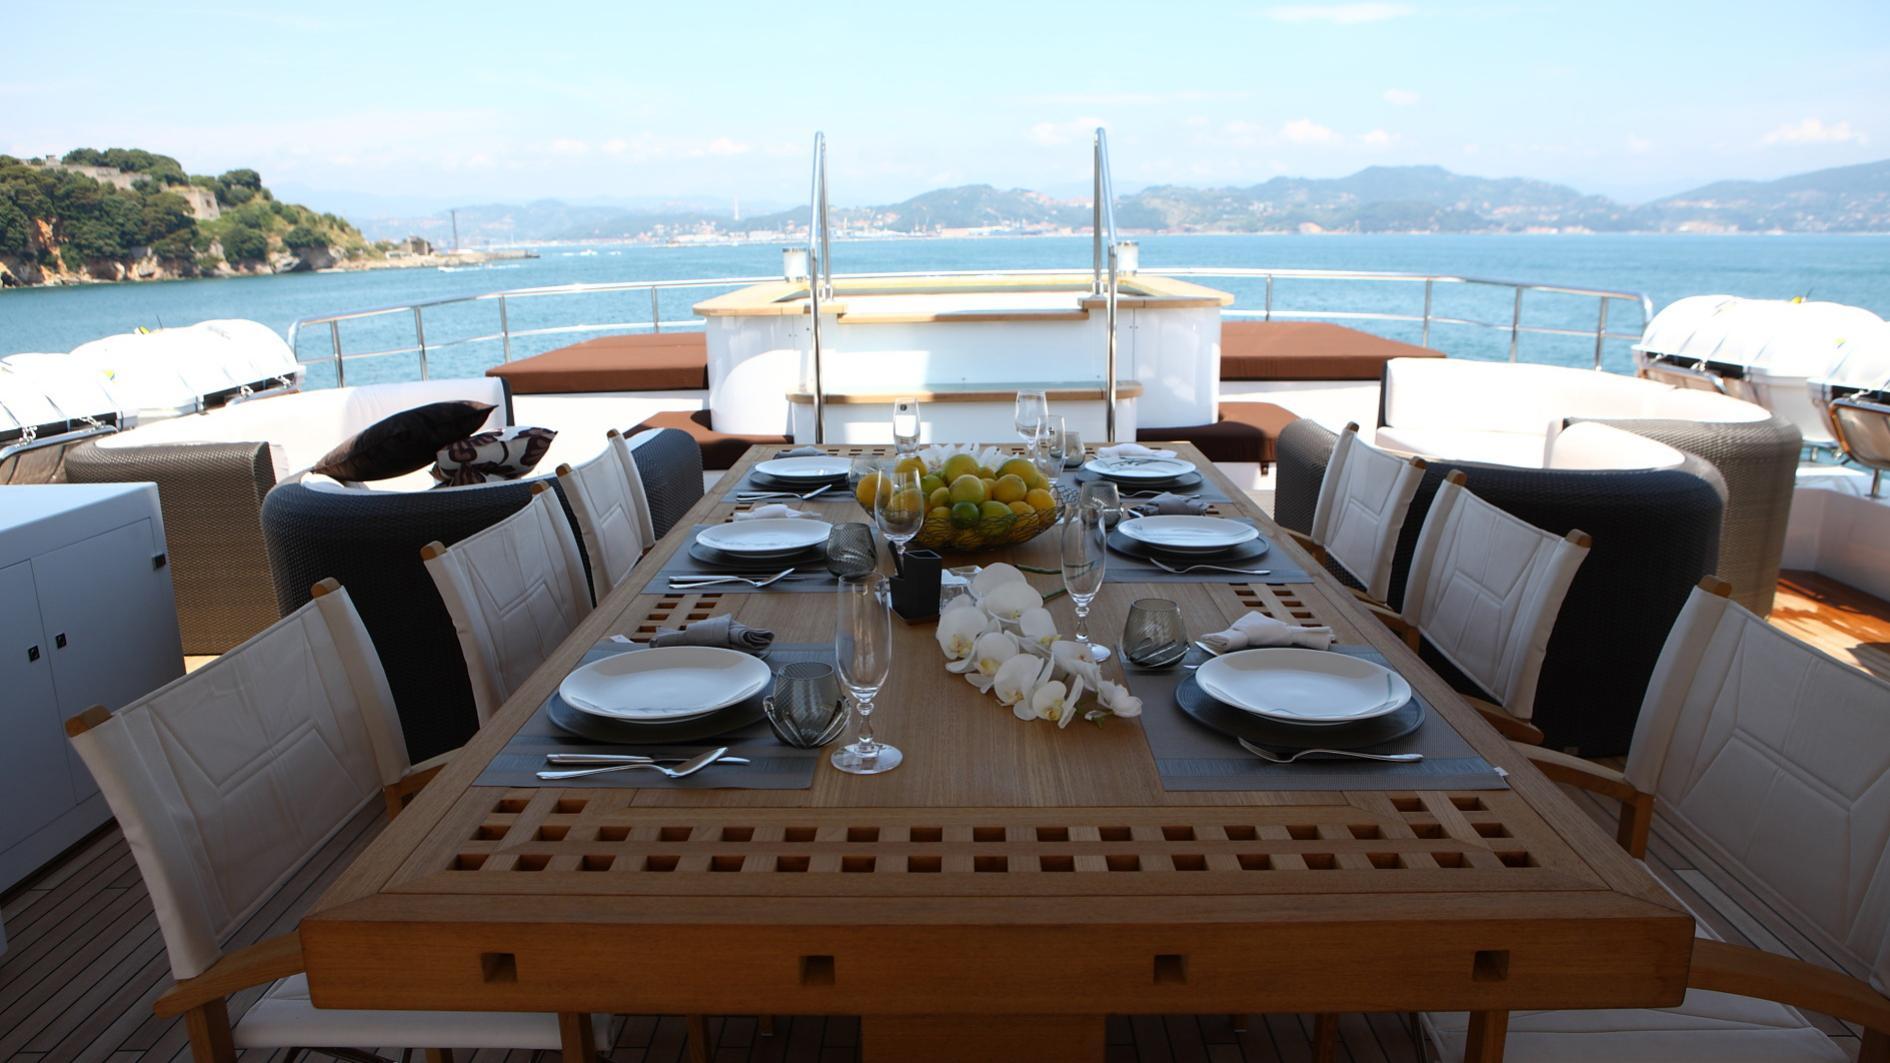 zaliv-iii-yacht-exterior-dining